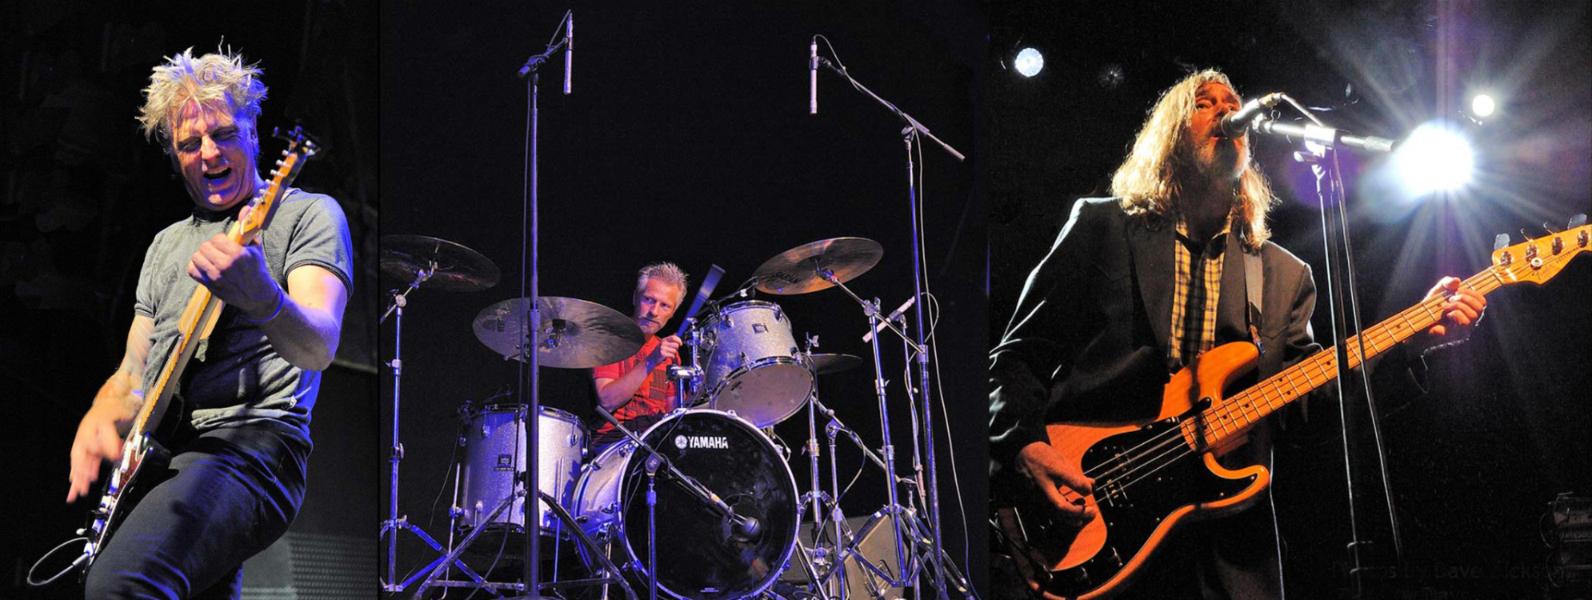 "2011-08-04 ""Sound Academy"" Toronto ON"